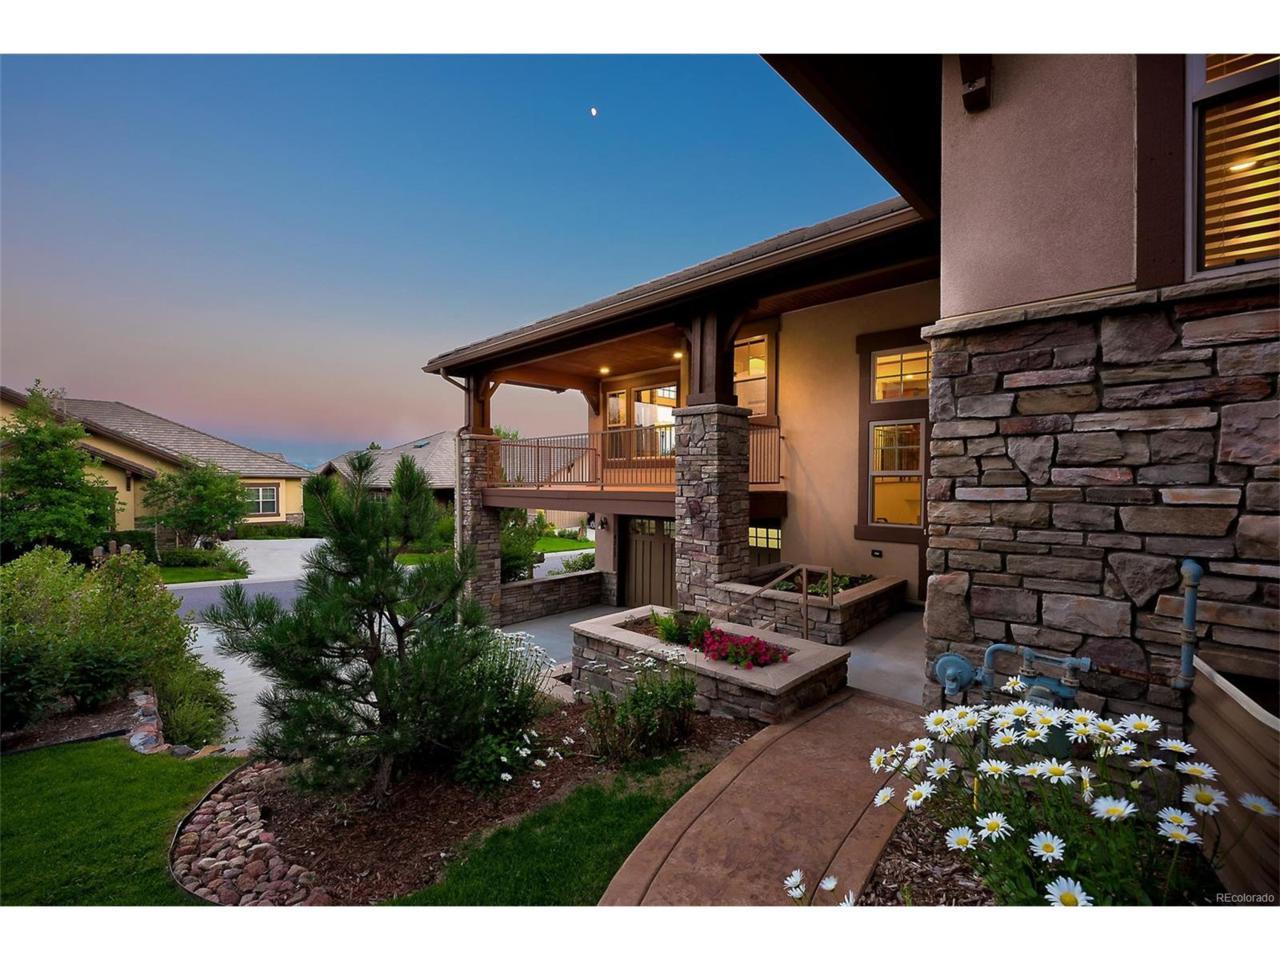 4313 Chateau Ridge Road, Castle Rock, CO 80108 (MLS #3409726) :: 8z Real Estate